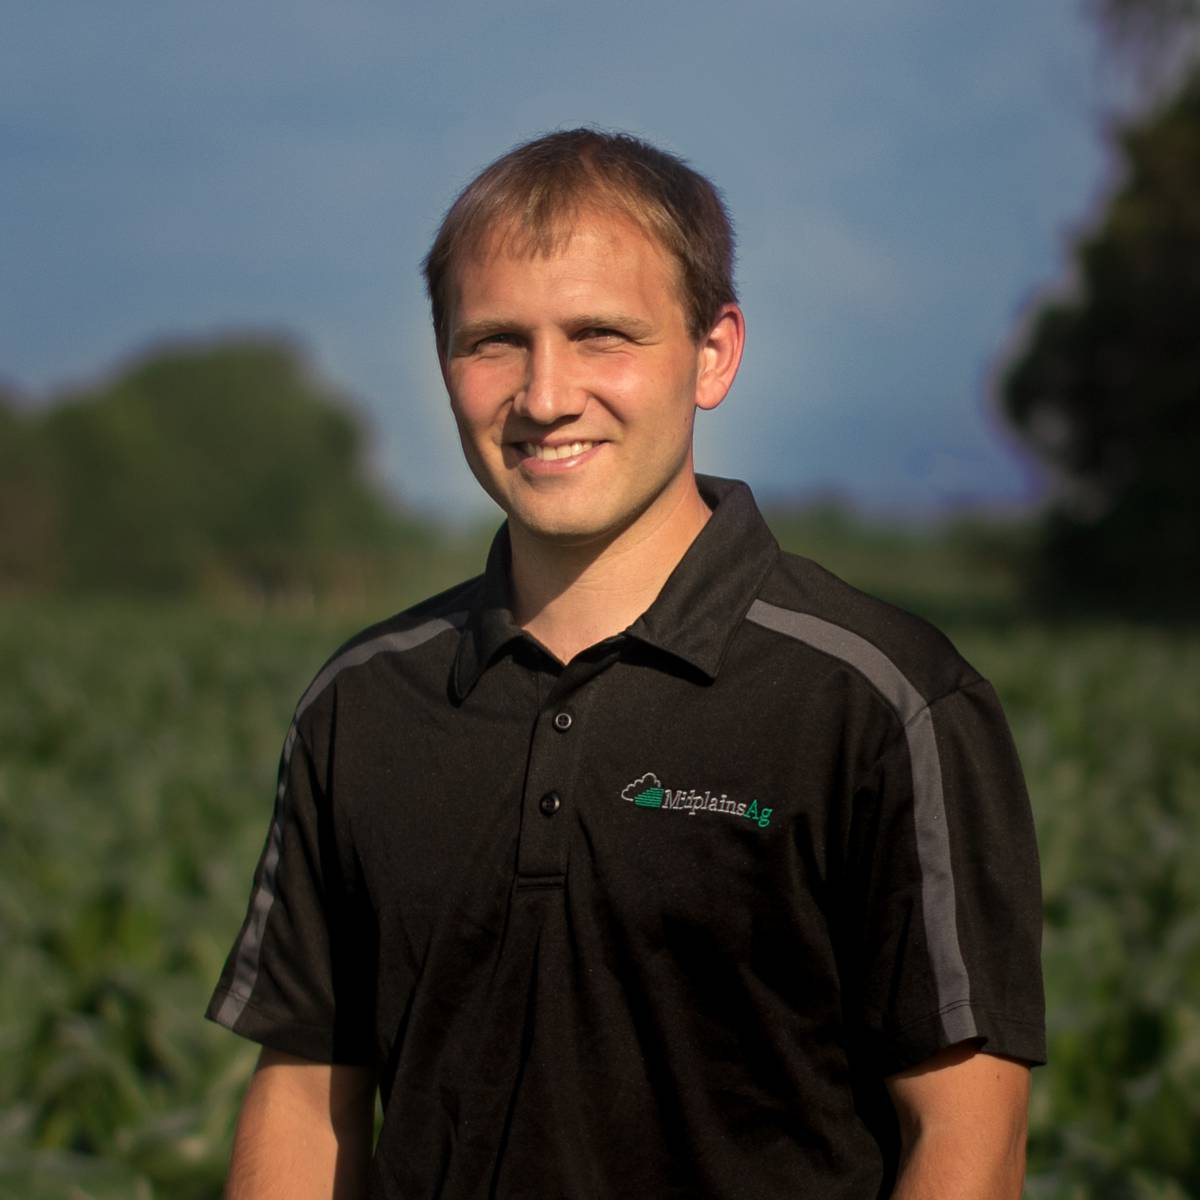 Ryan Hemenway | Lead Data Analyst | Midplains Ag